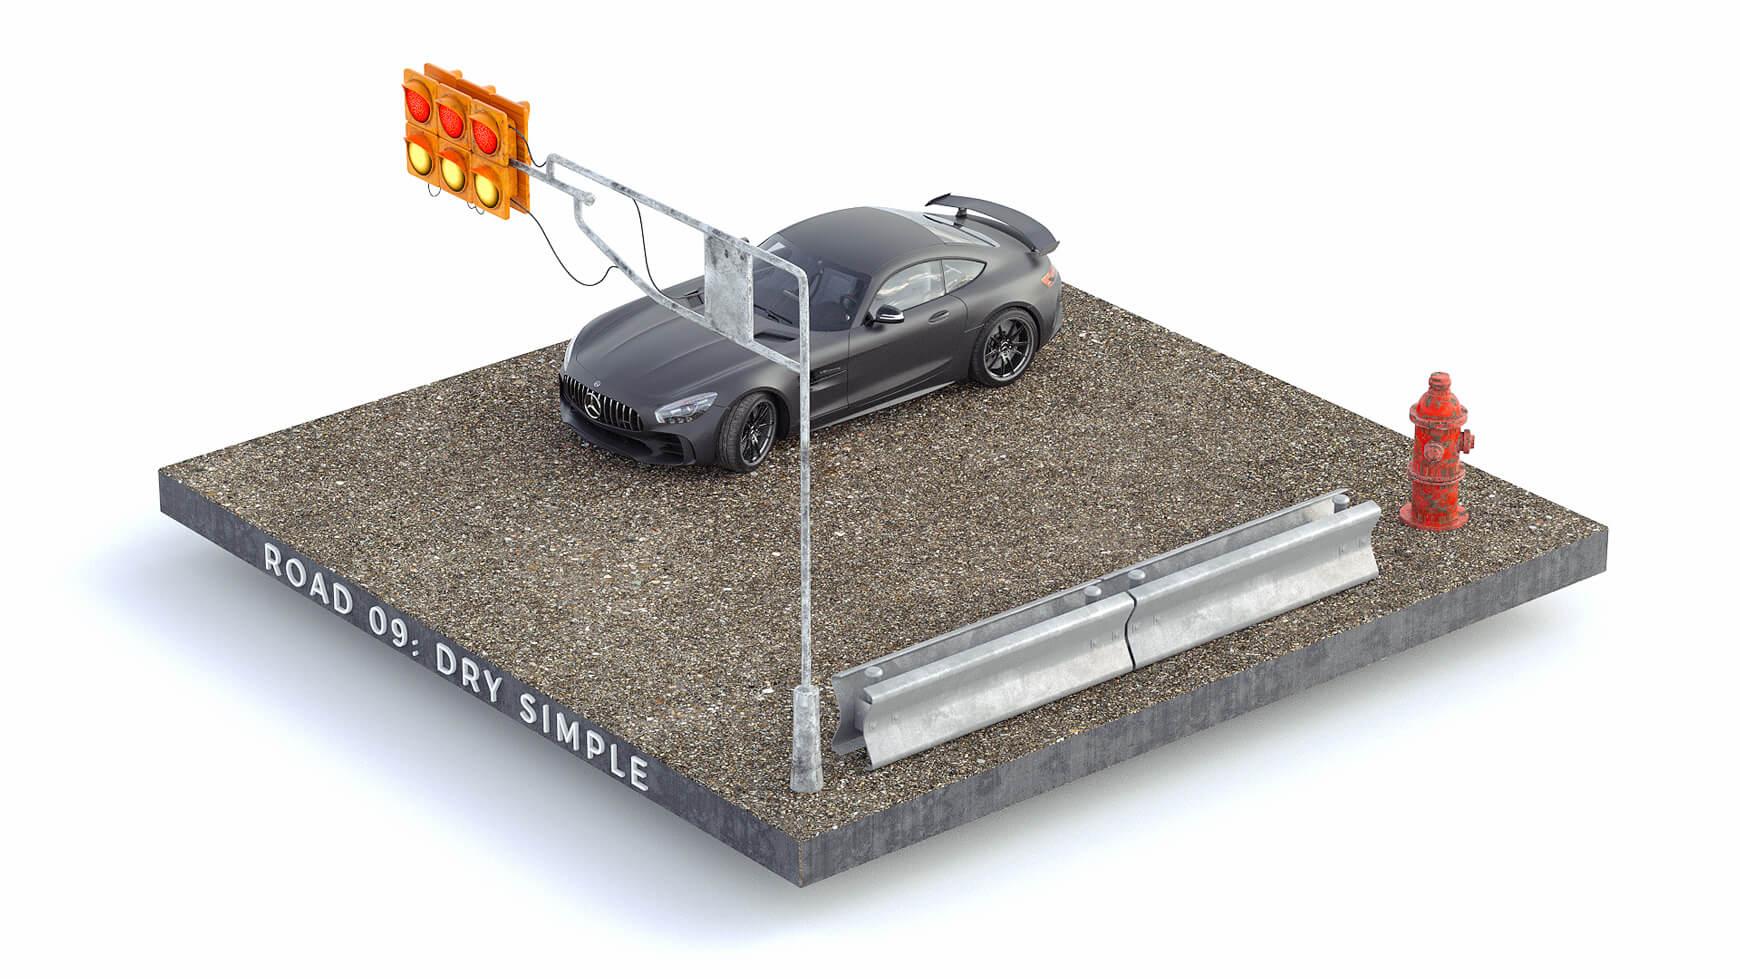 Cinema 4D 3D Streets Roads Textures Materials Dry Simple